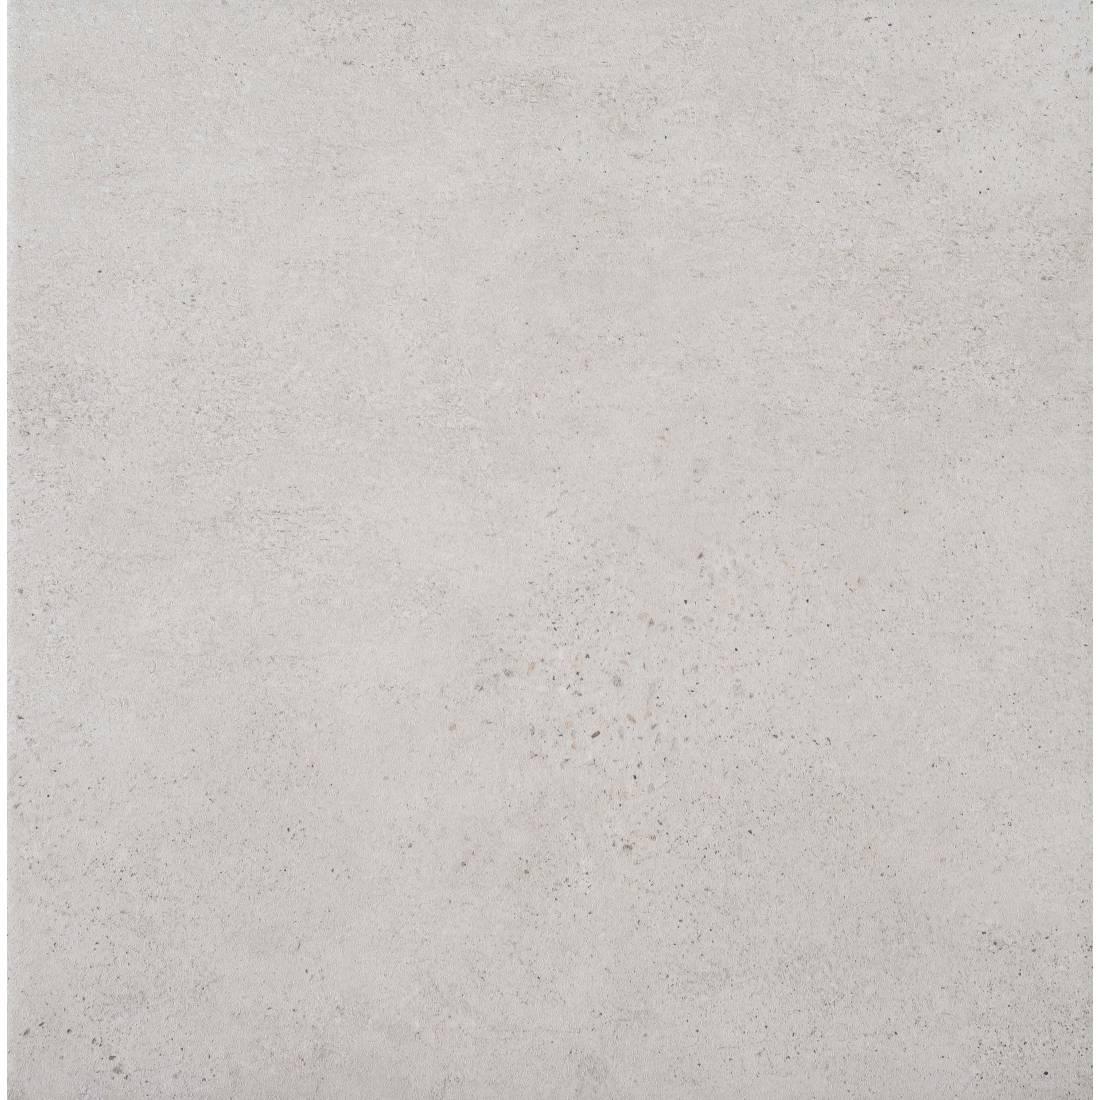 Altea 45x45 Blanco Matt 1